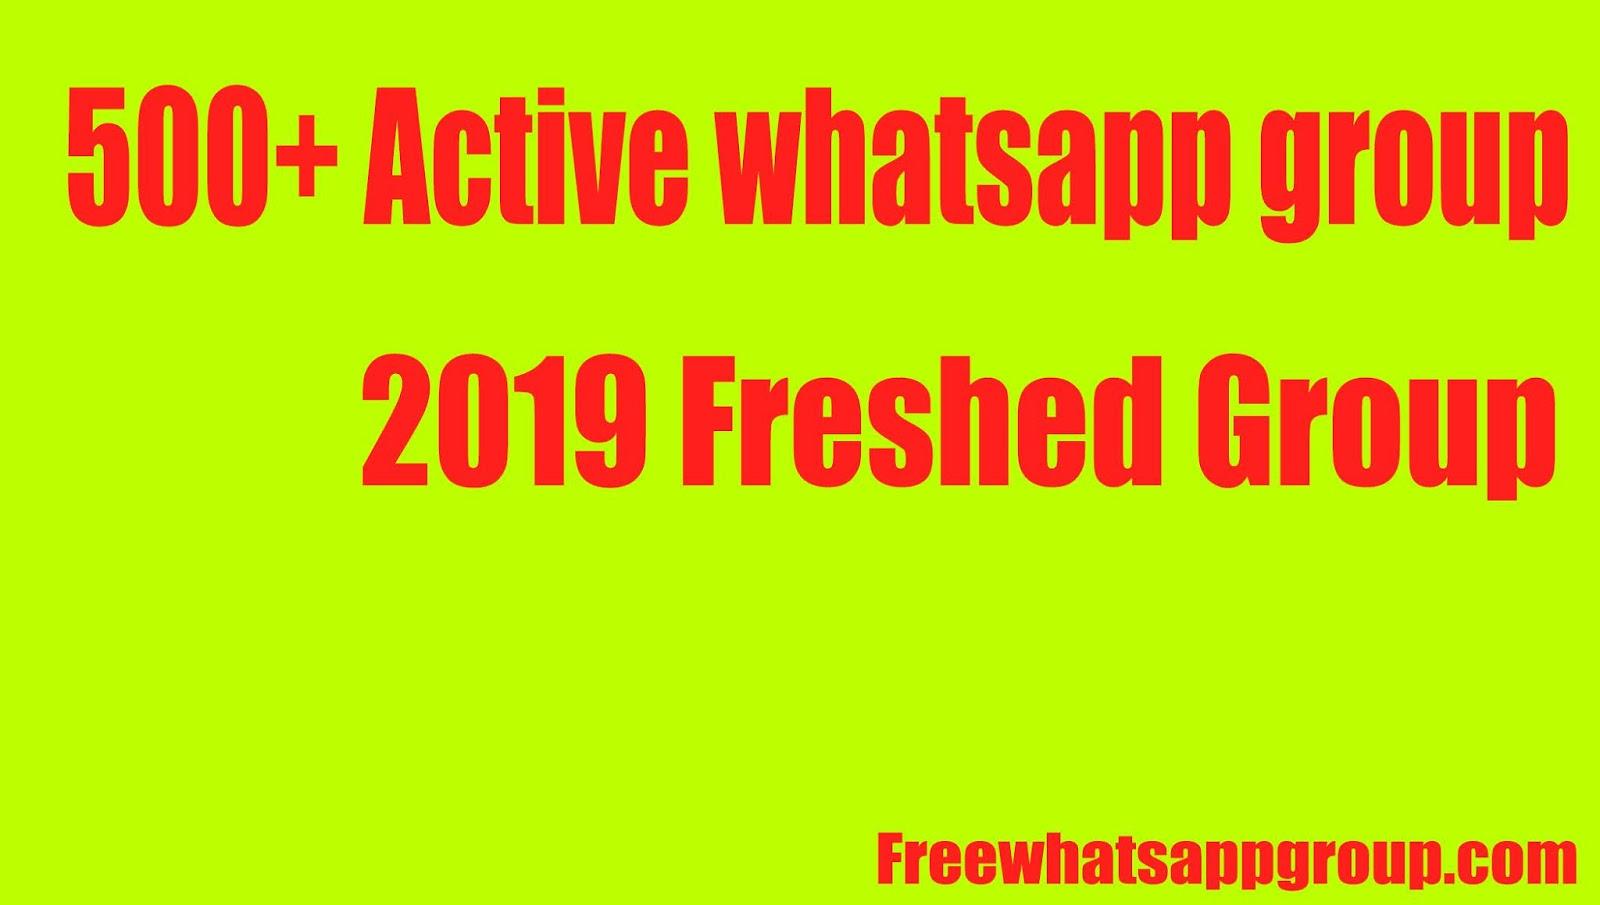 pakistani whatsapp groups links, pakistan whatsapp group